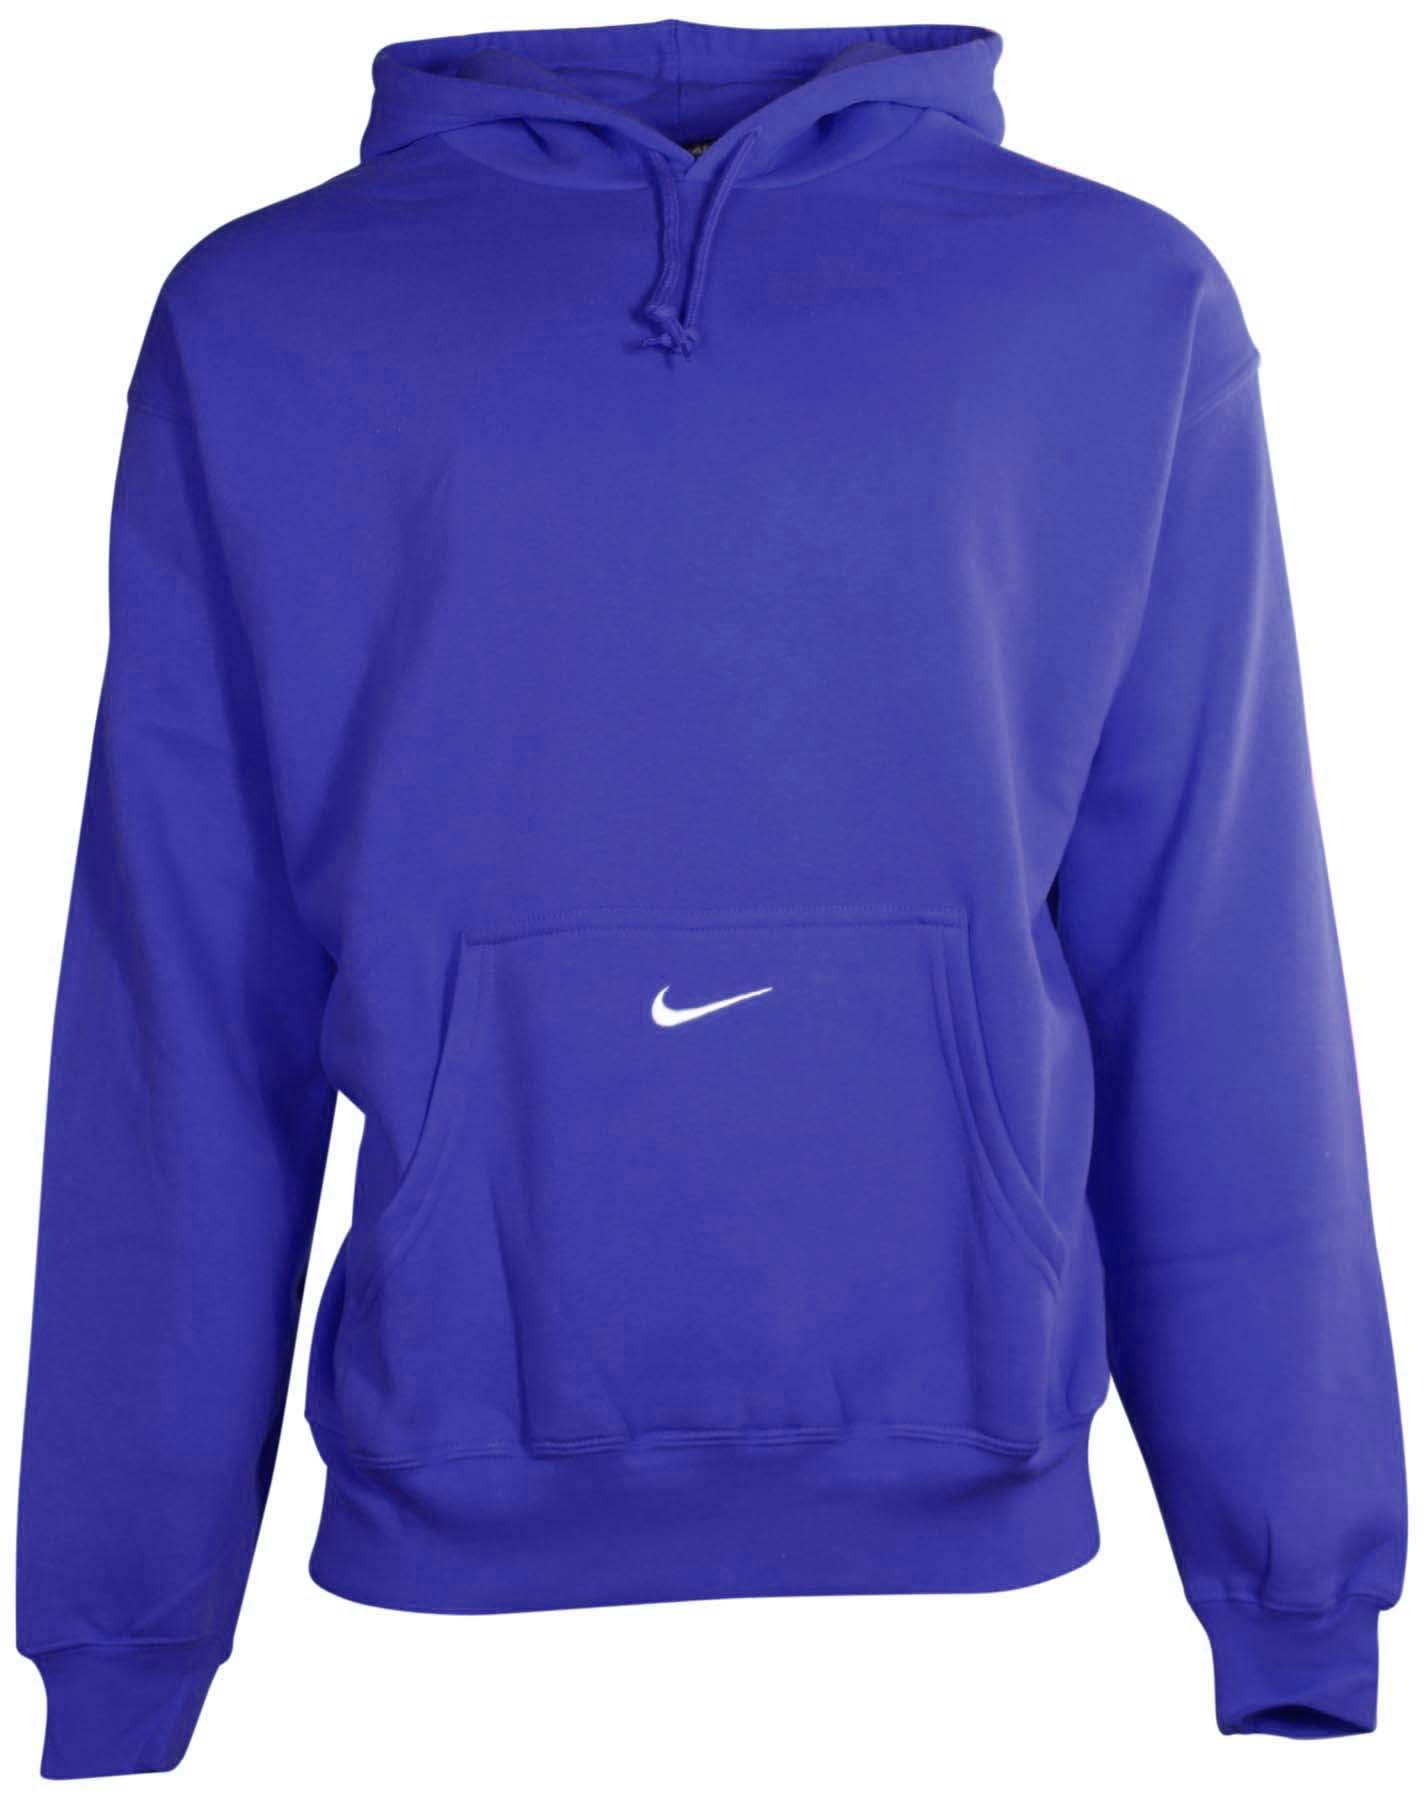 0c33f5d9a007 Stephen Curry Golden State Warriors Nike Time Warp Long Sleeve T-Shirt -  White - Walmart.com